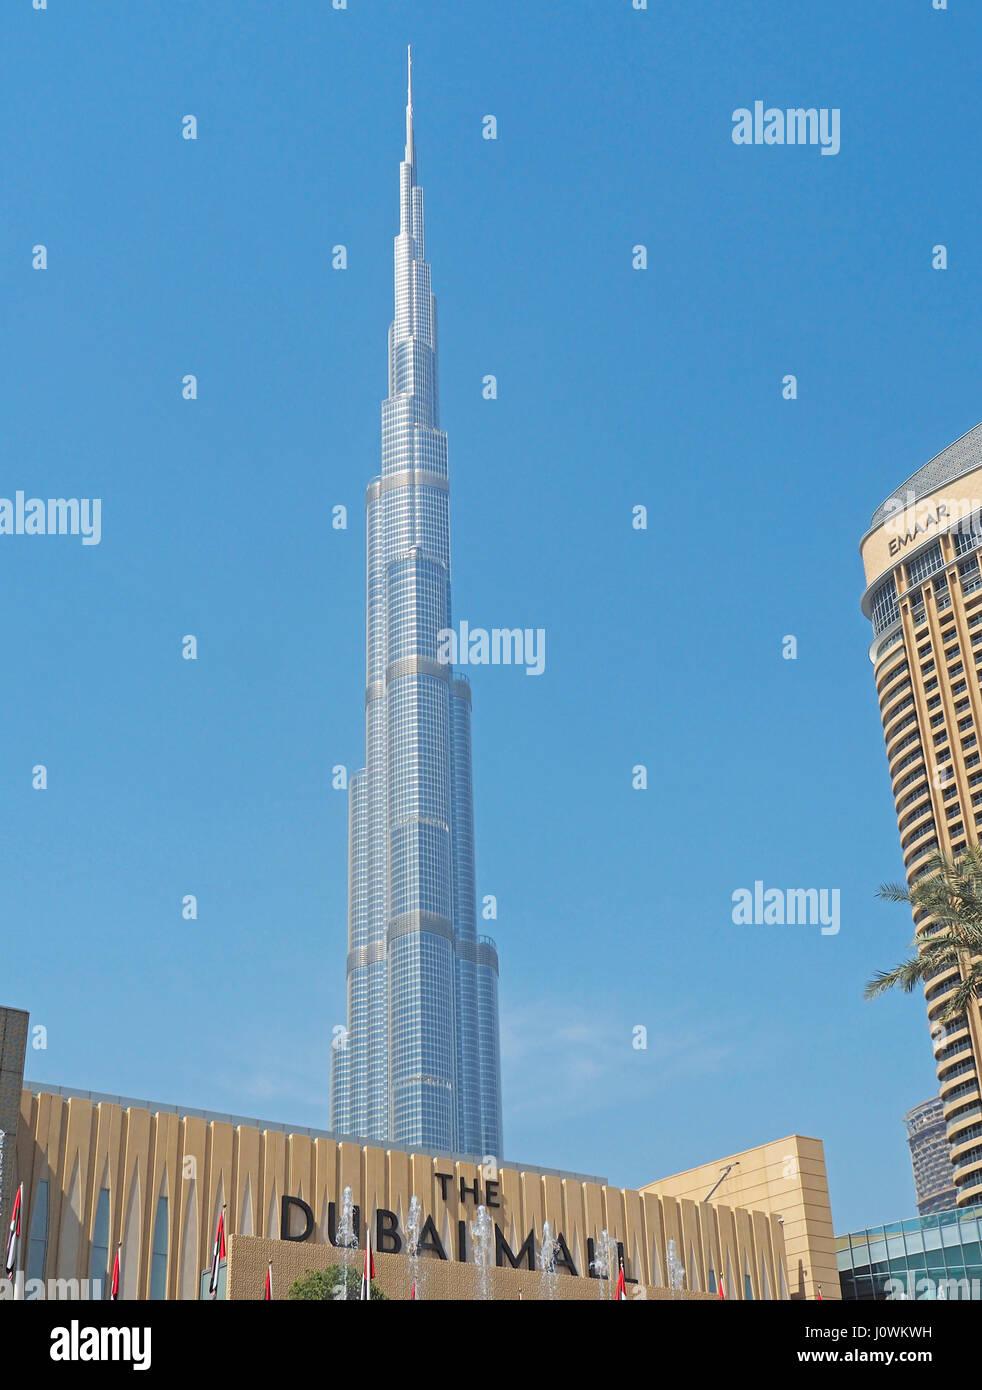 Wolkenkratzer Burj Khalifa in Dubai, VAE. Stockbild